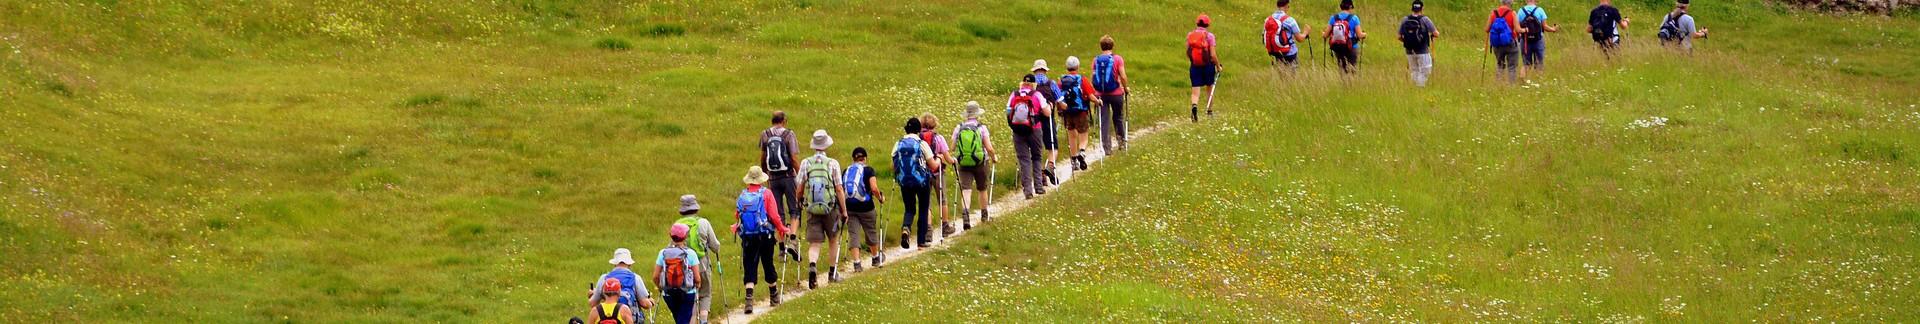 hiking-2540189-1920-528